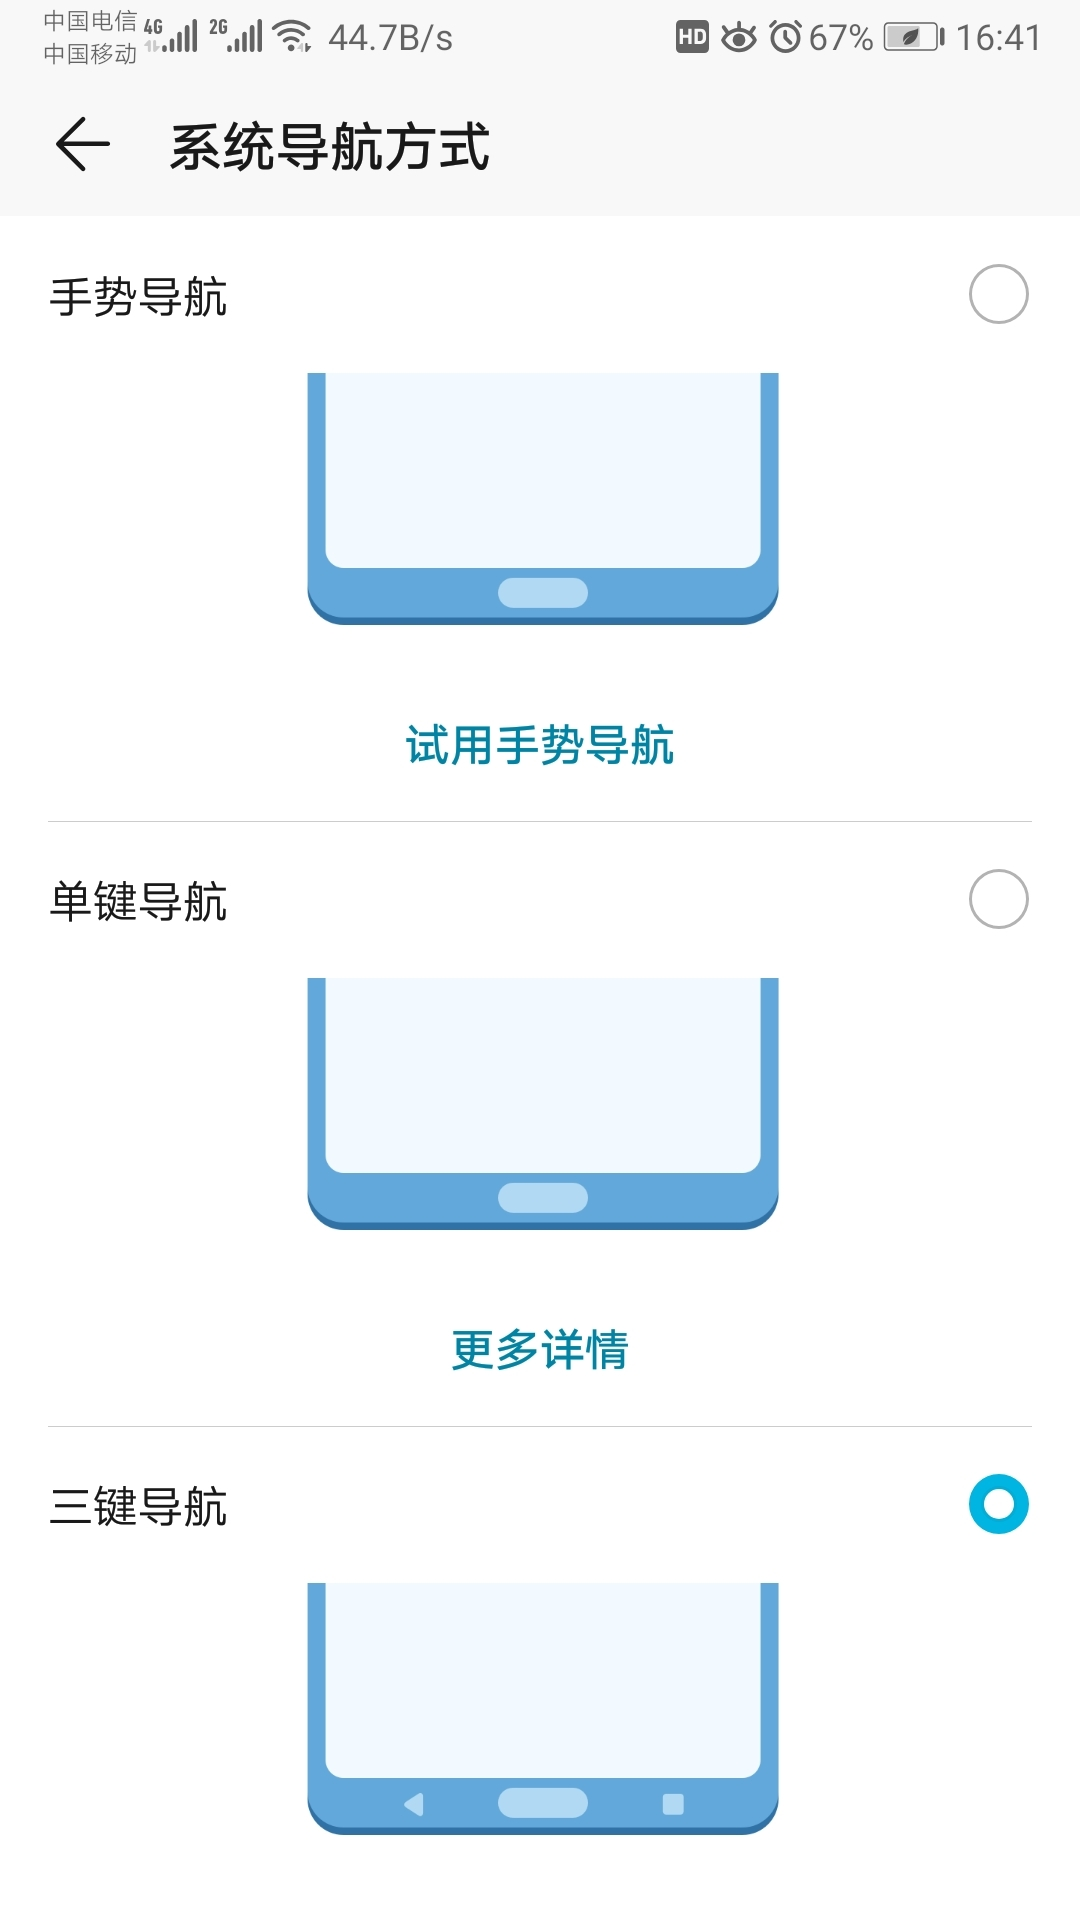 Screenshot_20210510_164109_com.android.settings.jpg